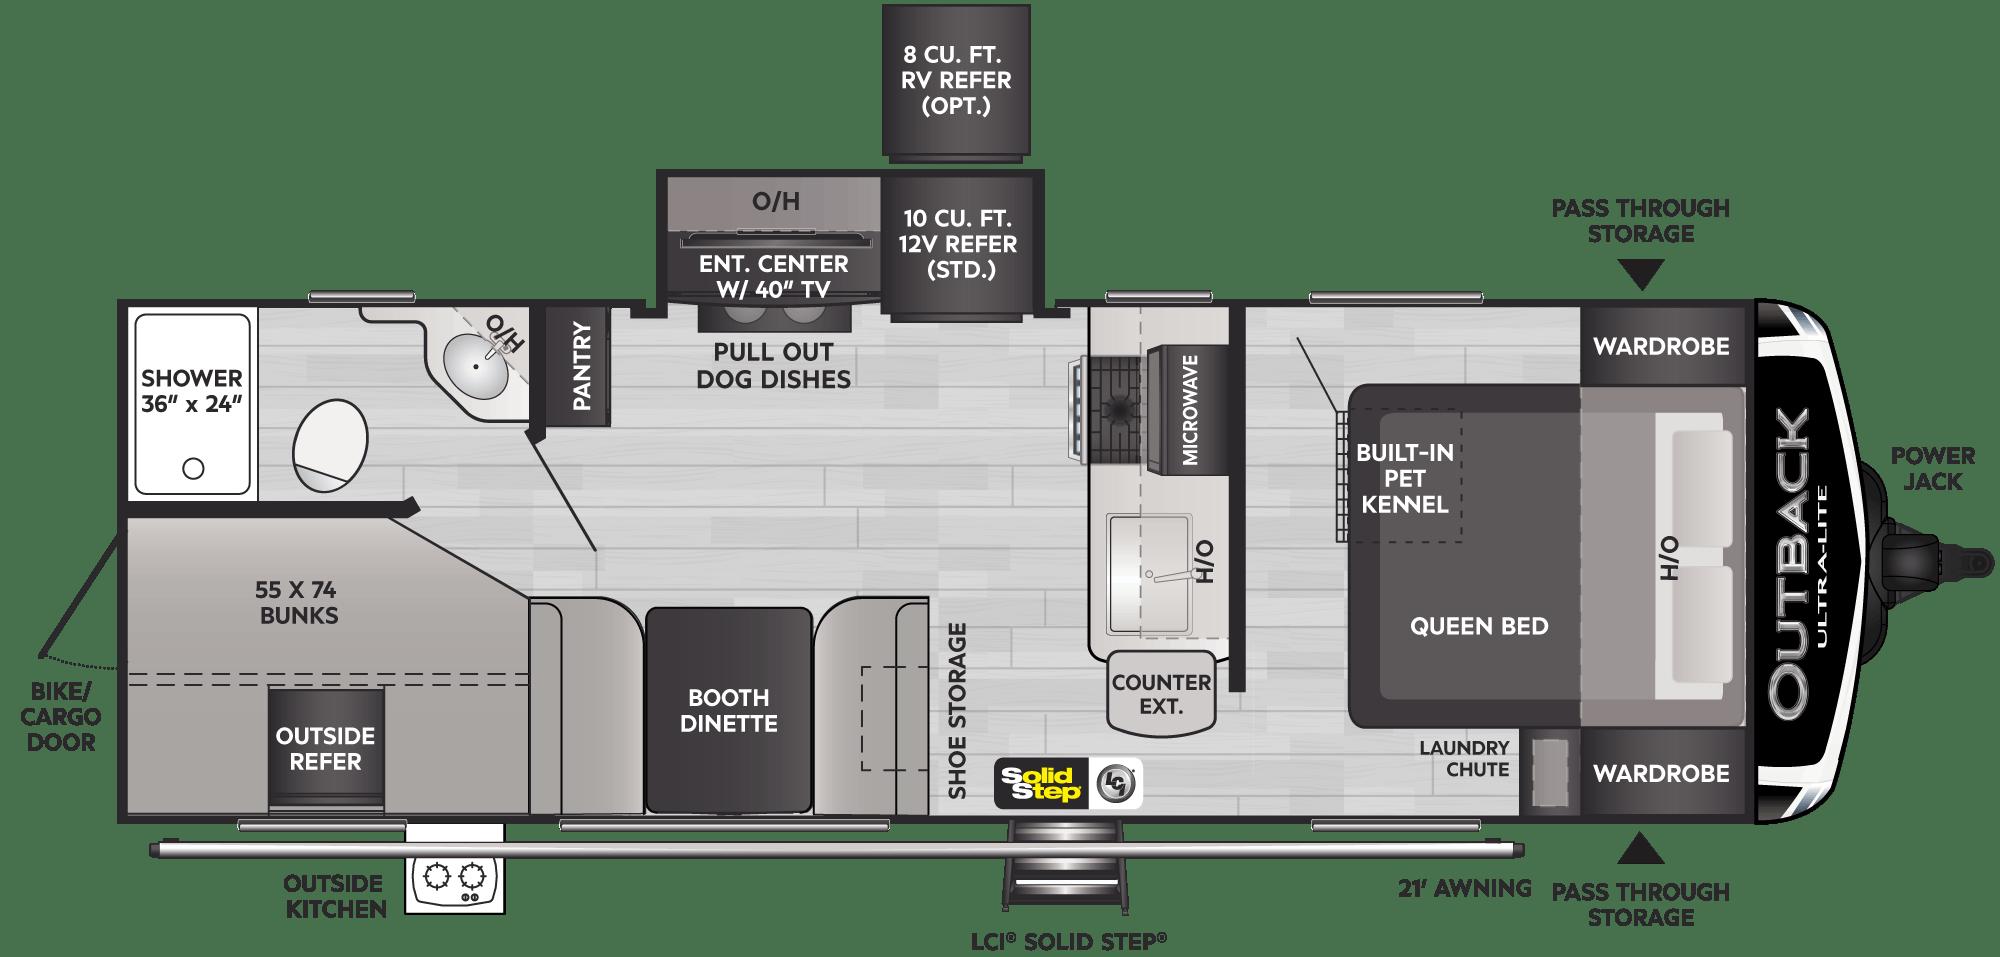 Floorplan of RV model 244UBH